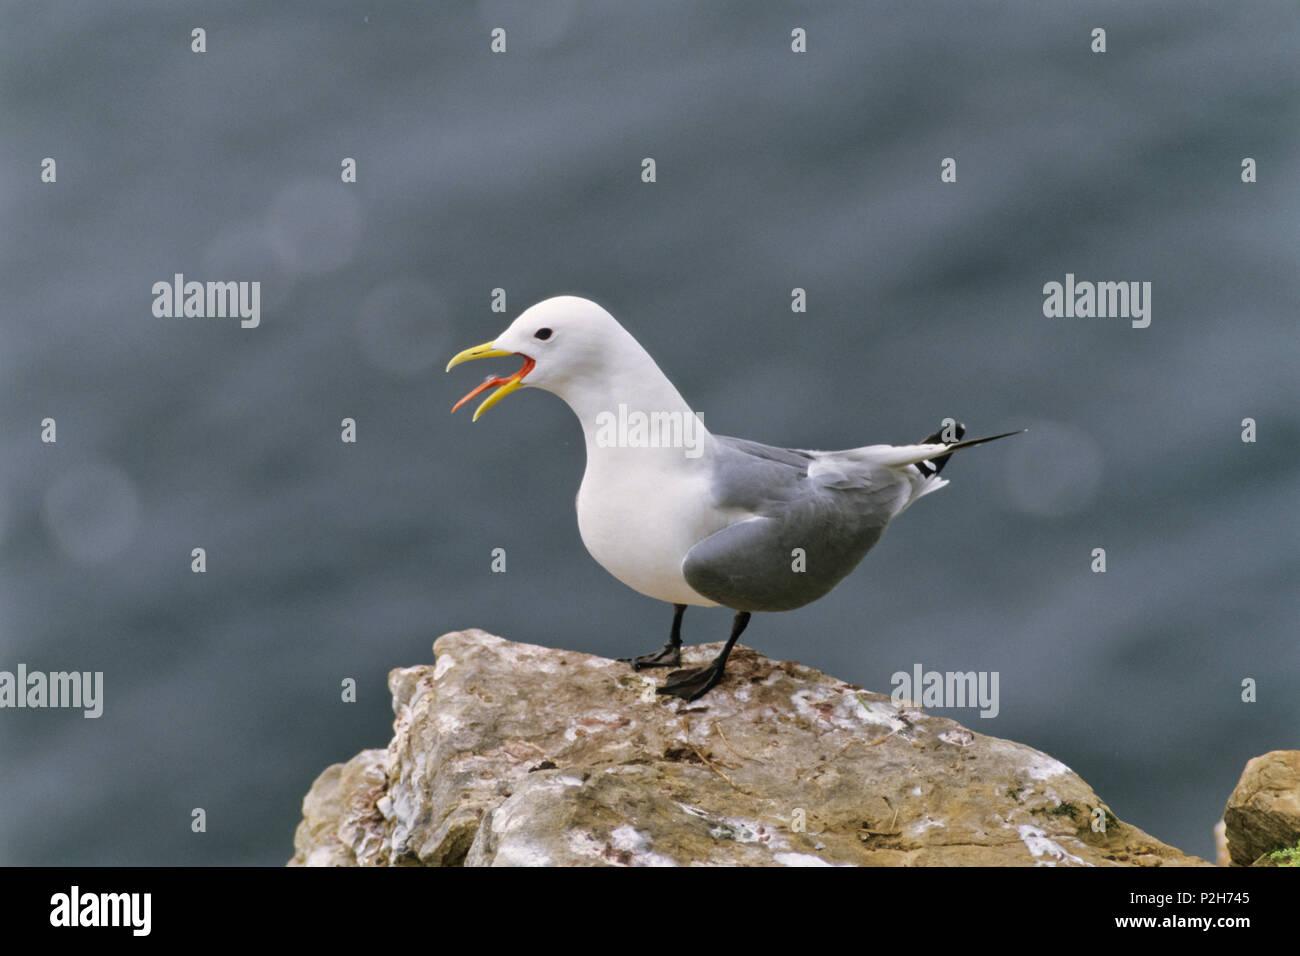 Kittiwake calling, Rissa tridactyla, Shetland Islands, Scotland - Stock Image